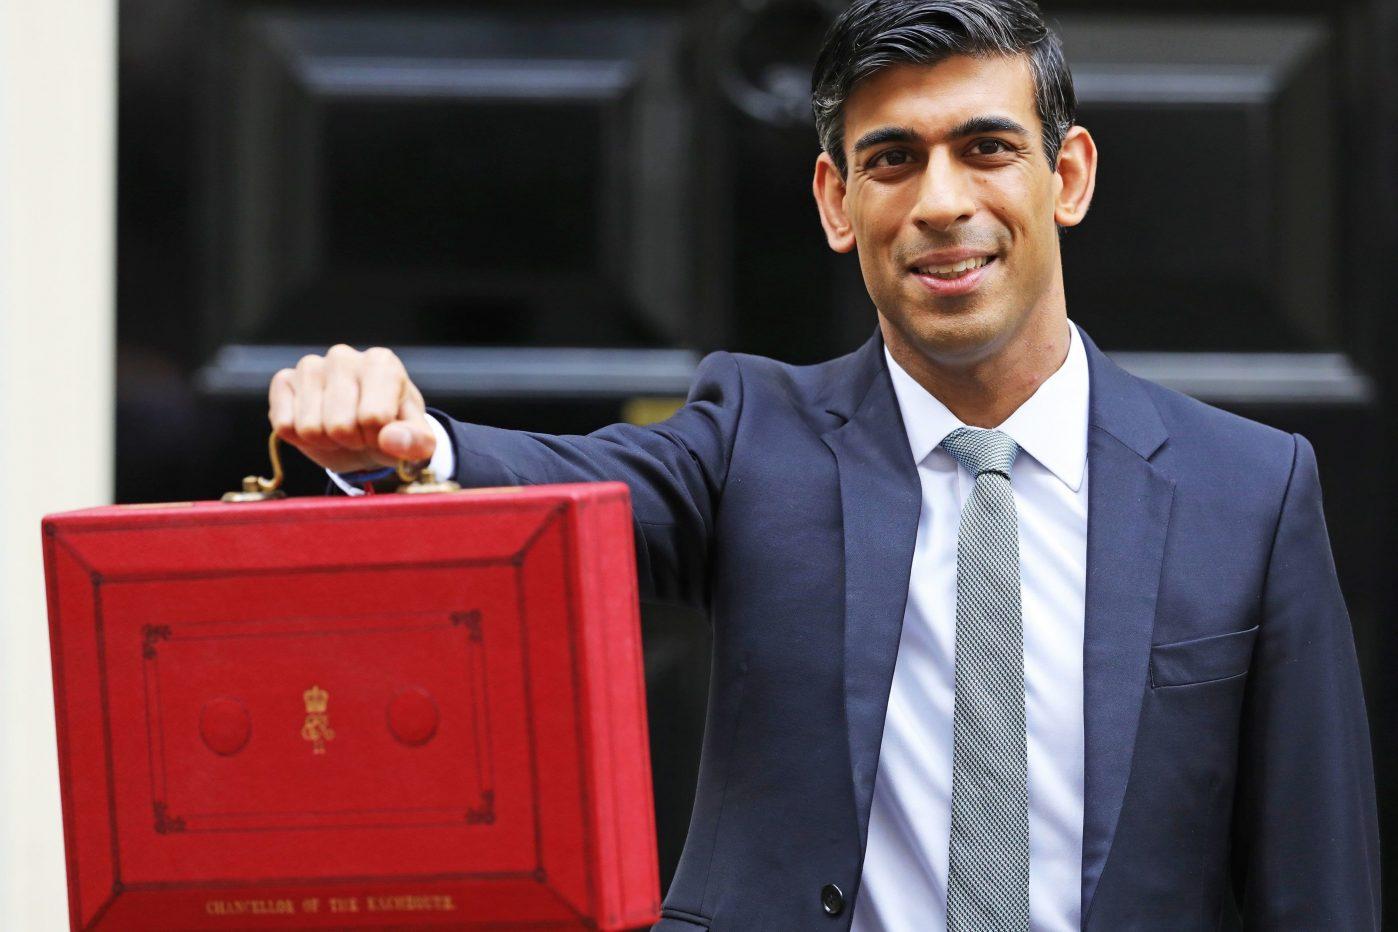 Could Rishi Sunak be Boris Johnon's successor?